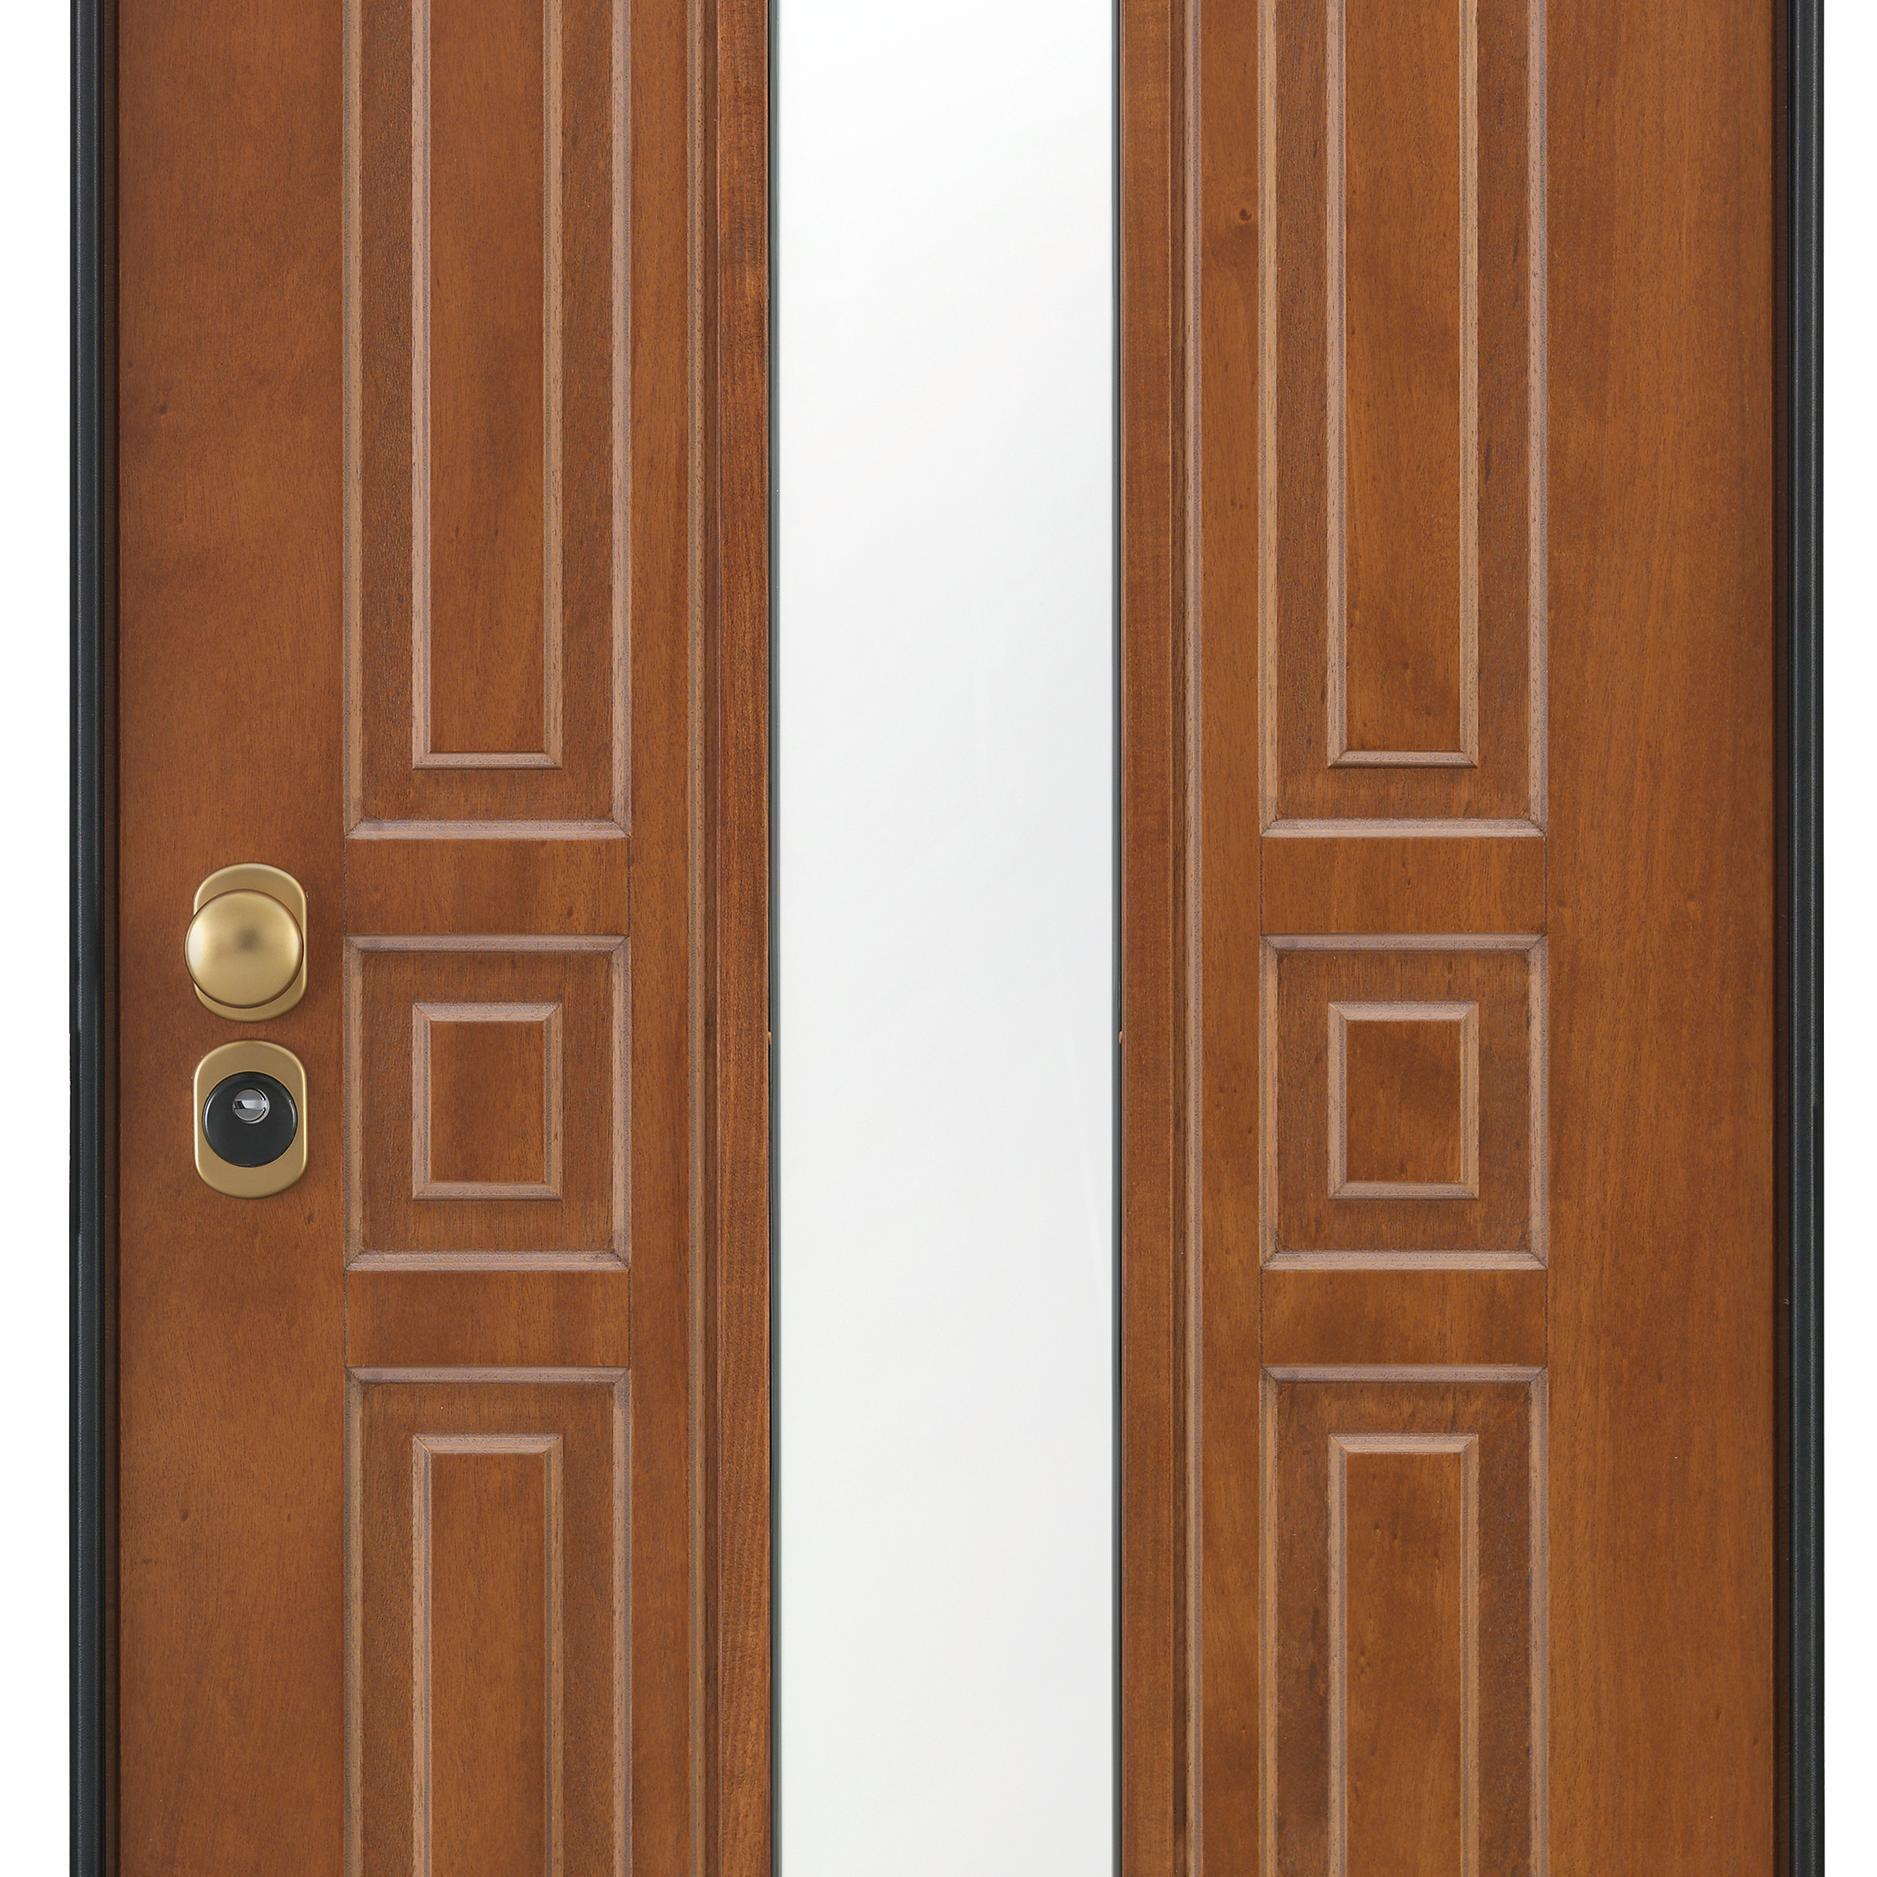 Porta blindata Mirror noce L 90 x H 210 cm destra - 13